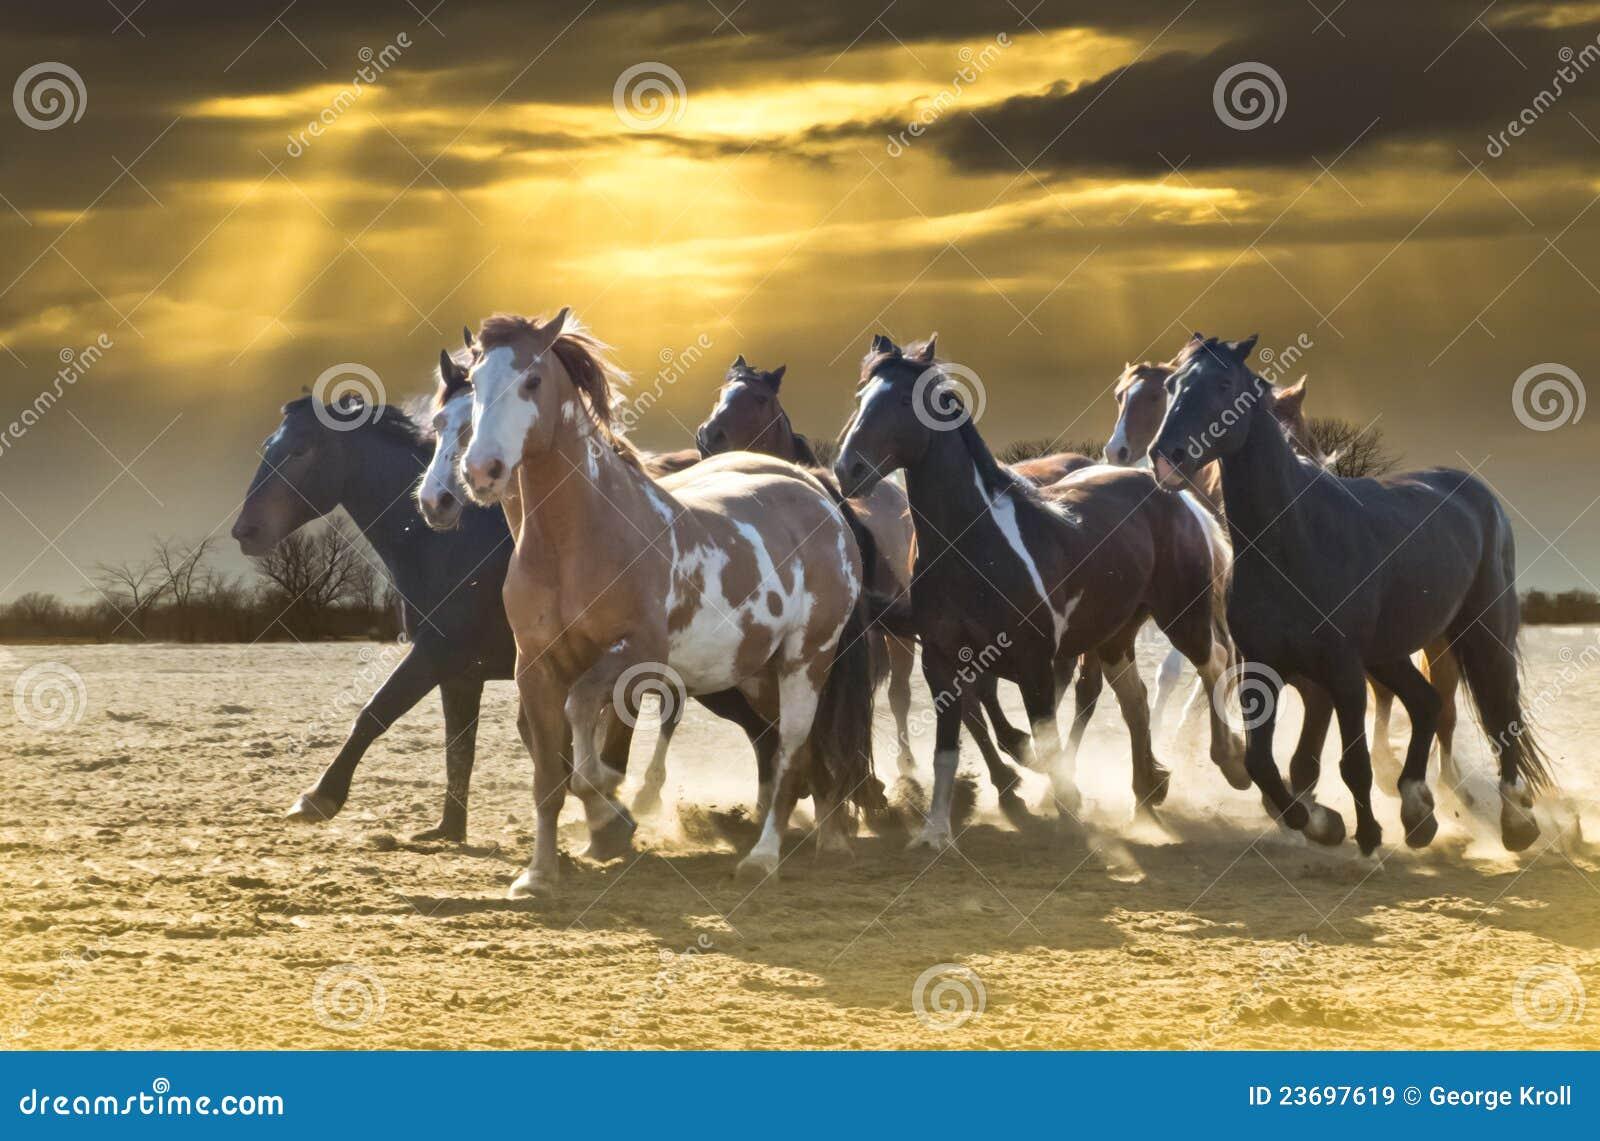 Pferden-Ansturm gegen schönen Himmel